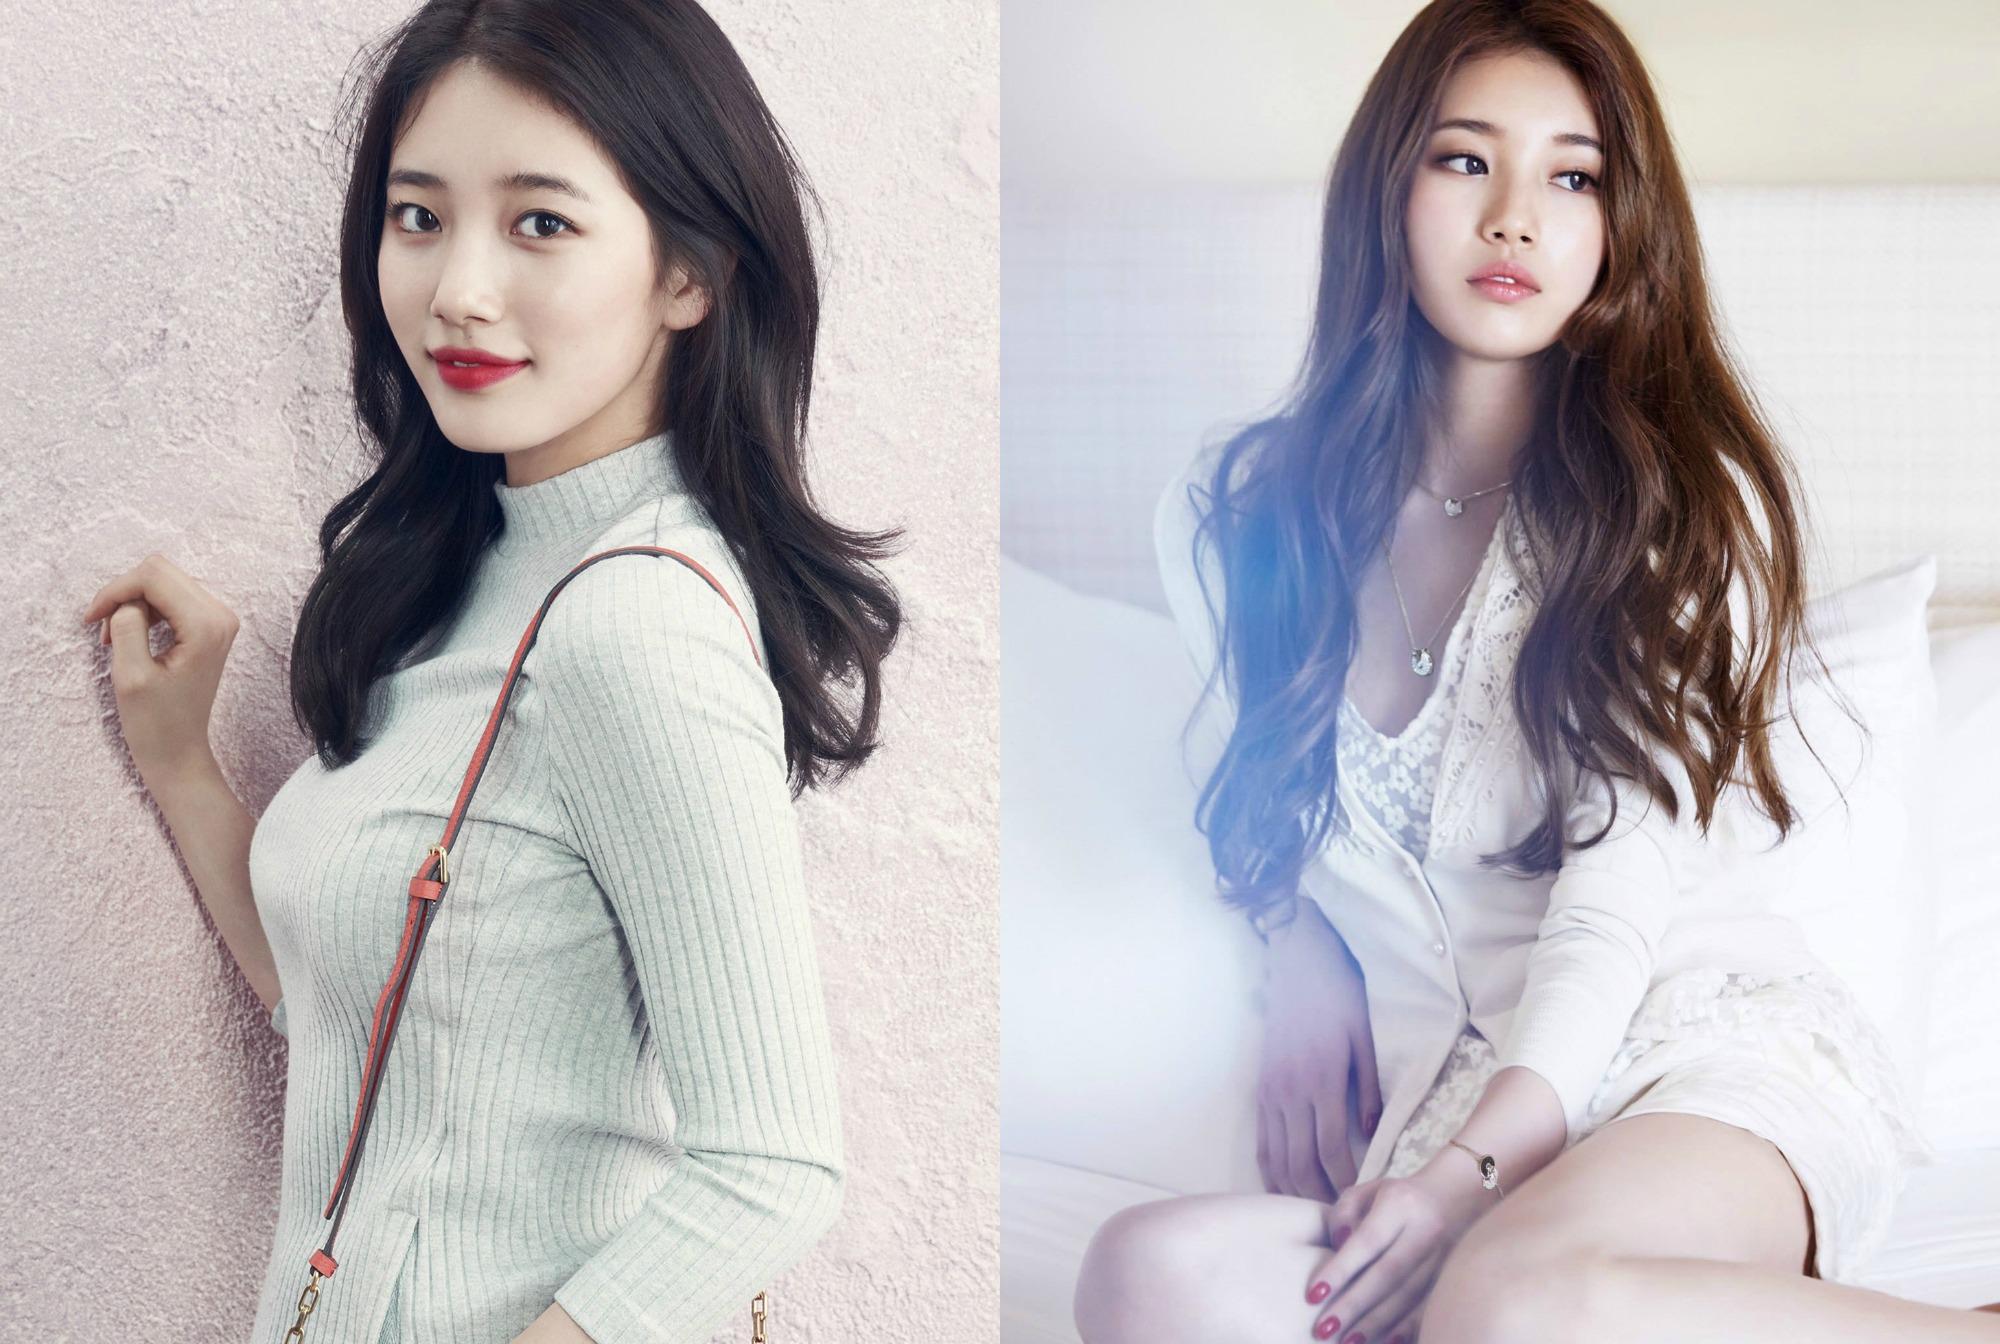 Stupendous Haircut Inspirations Kpop Korean Hair And Style Short Hairstyles For Black Women Fulllsitofus